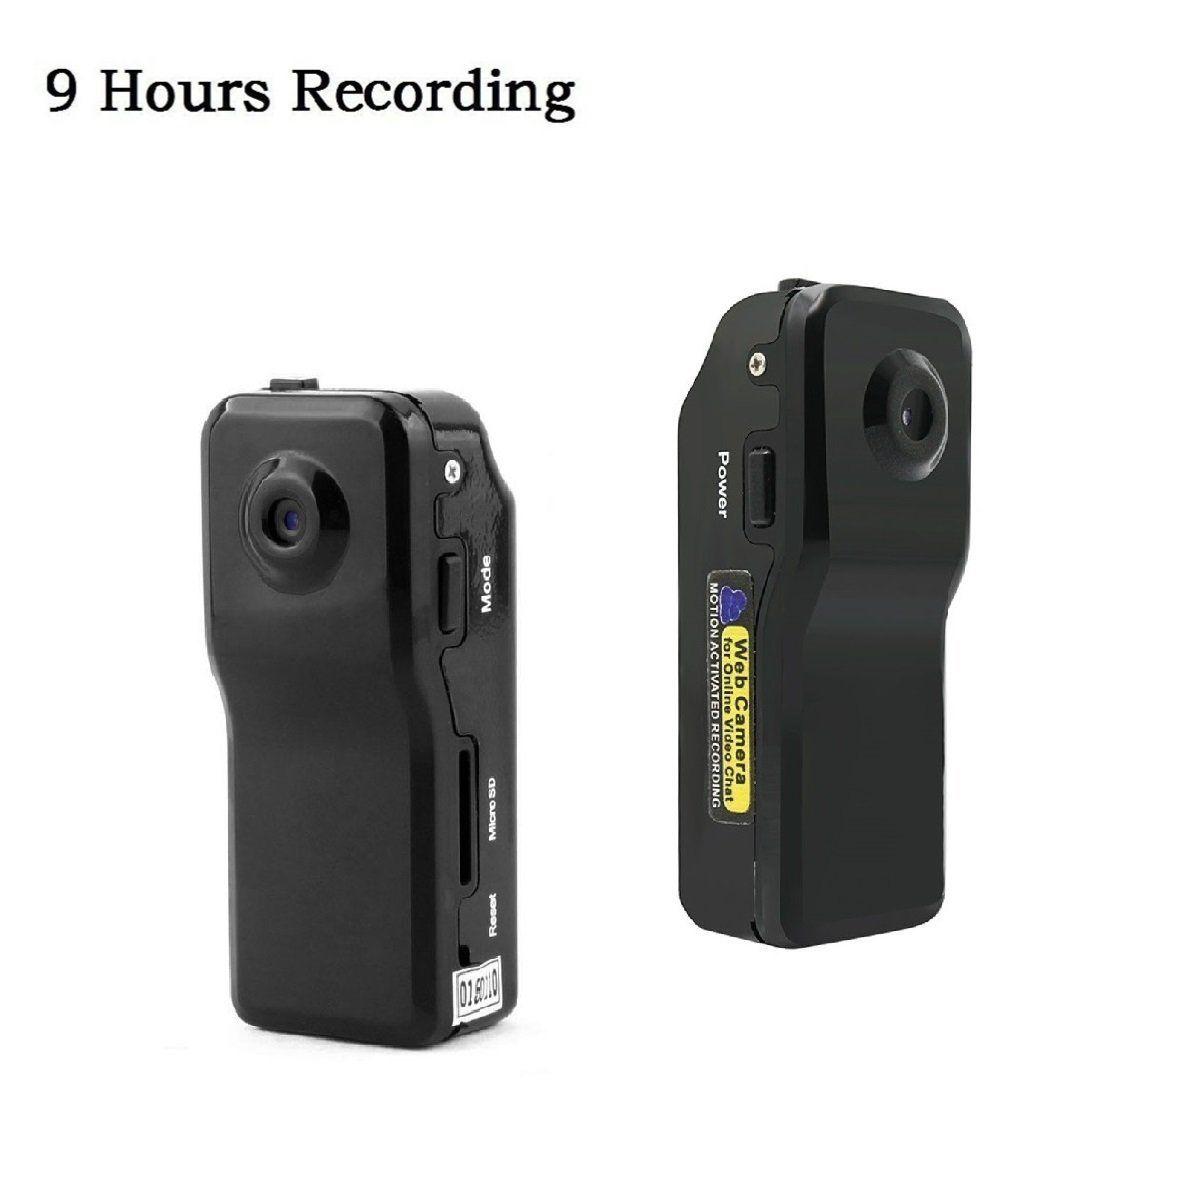 Mini spy camera 960P HD Hidden Noise Activation Nanny Camera with Motion Detection - Main